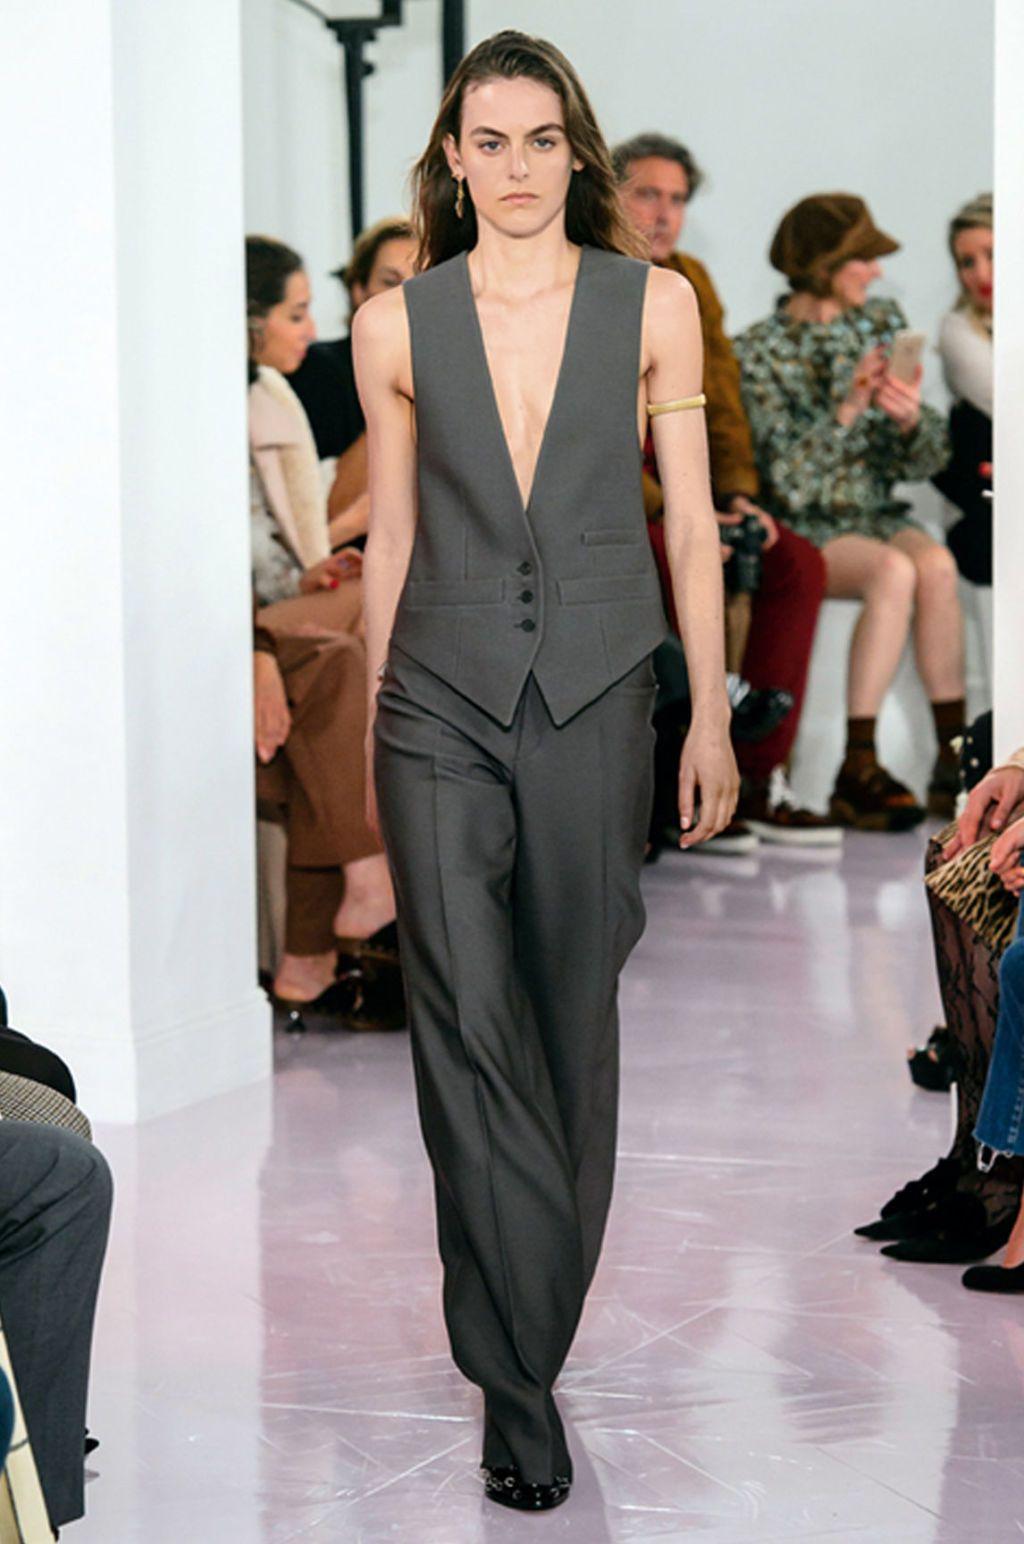 Estate Pantaloni Moda Tendenze Yidweh29 Roberto 2018 Donna Primavera CrtsxhQdB